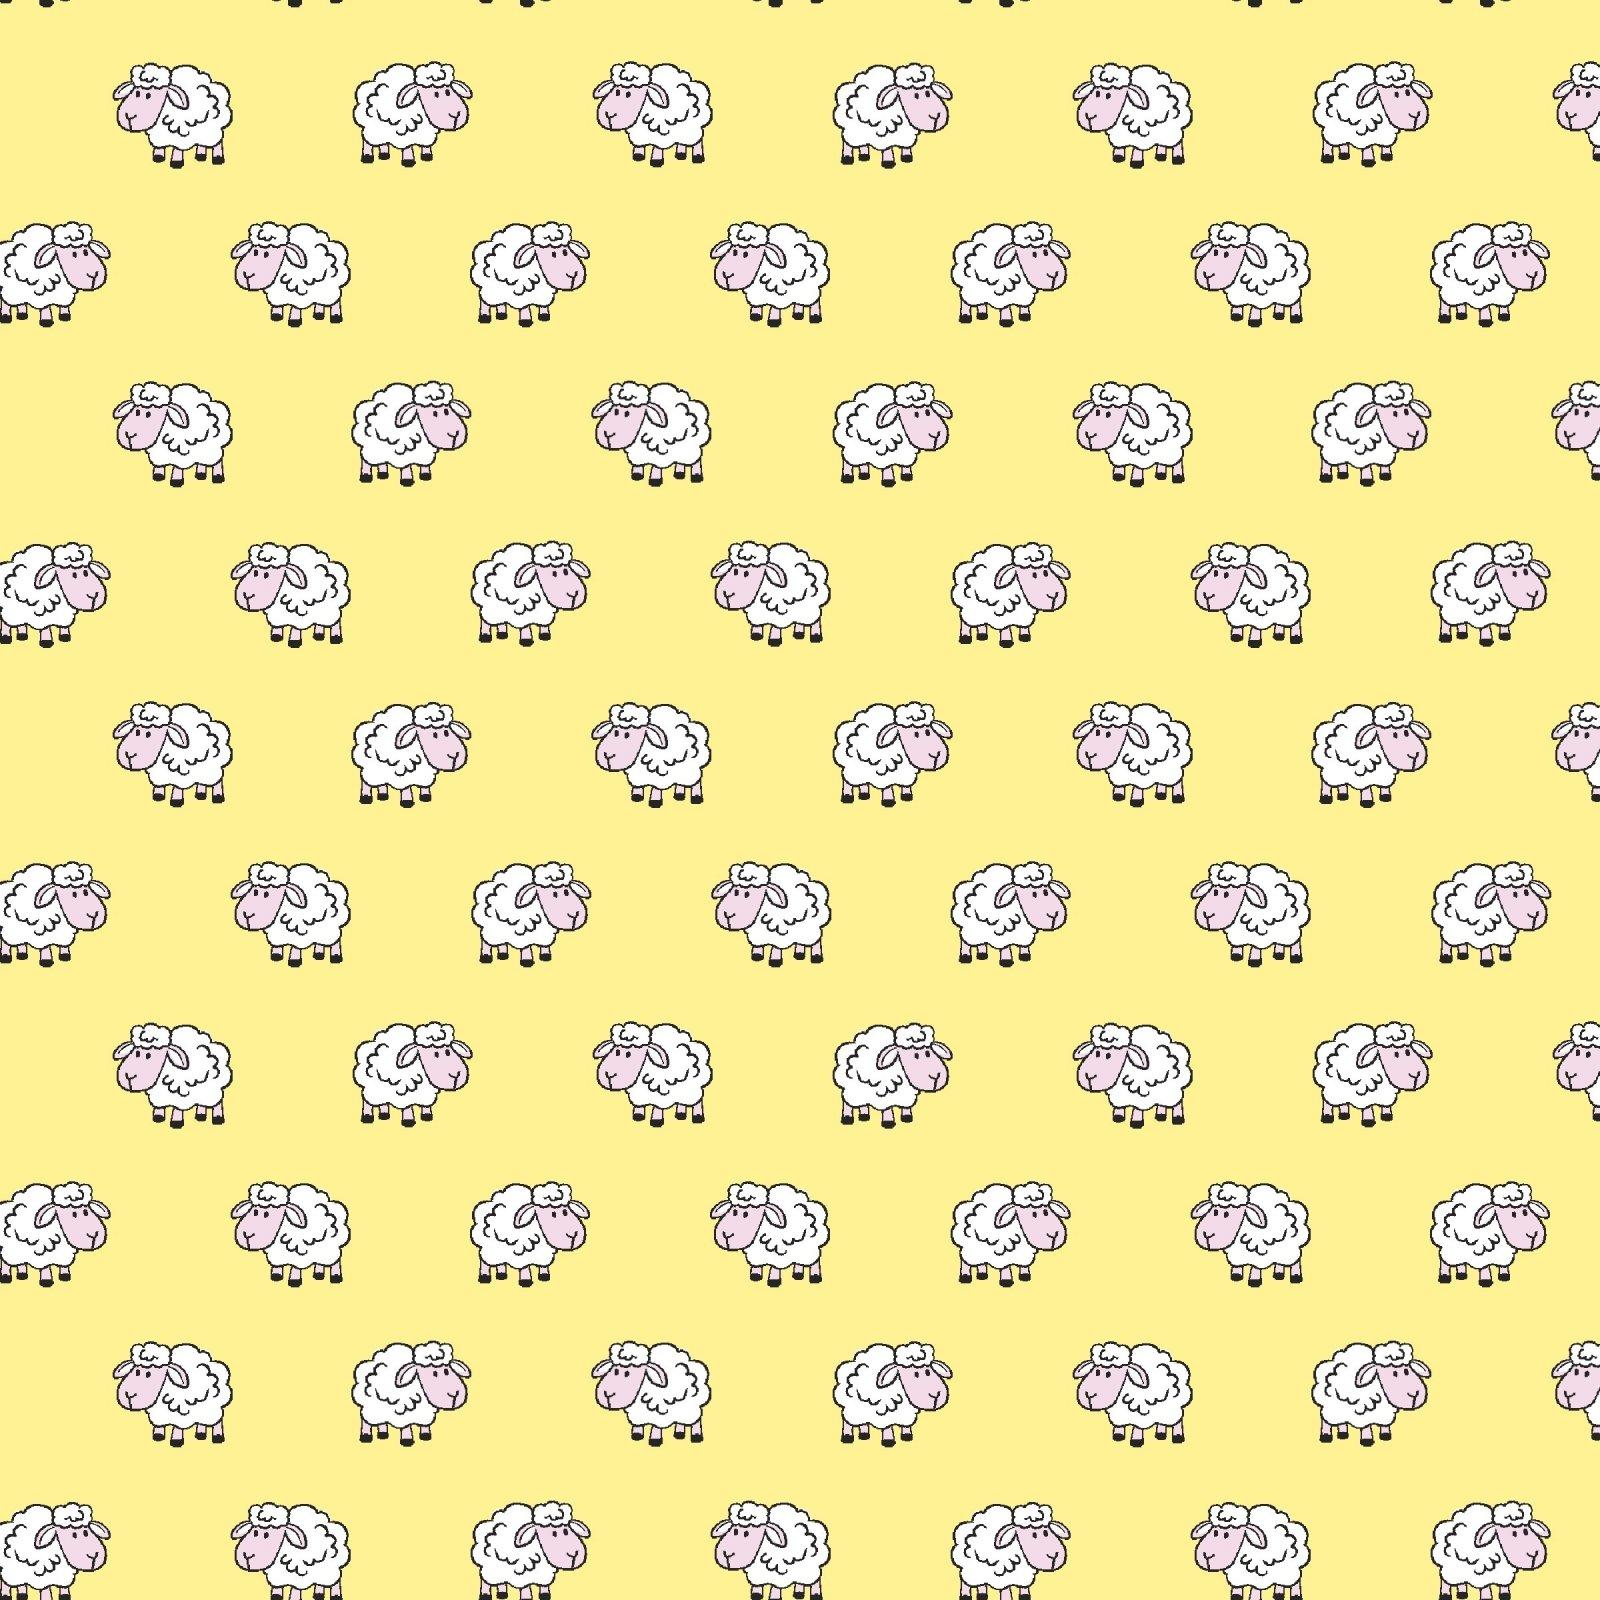 FE-Playful Cuties 4 14981 Yellow - Sheep Flannel